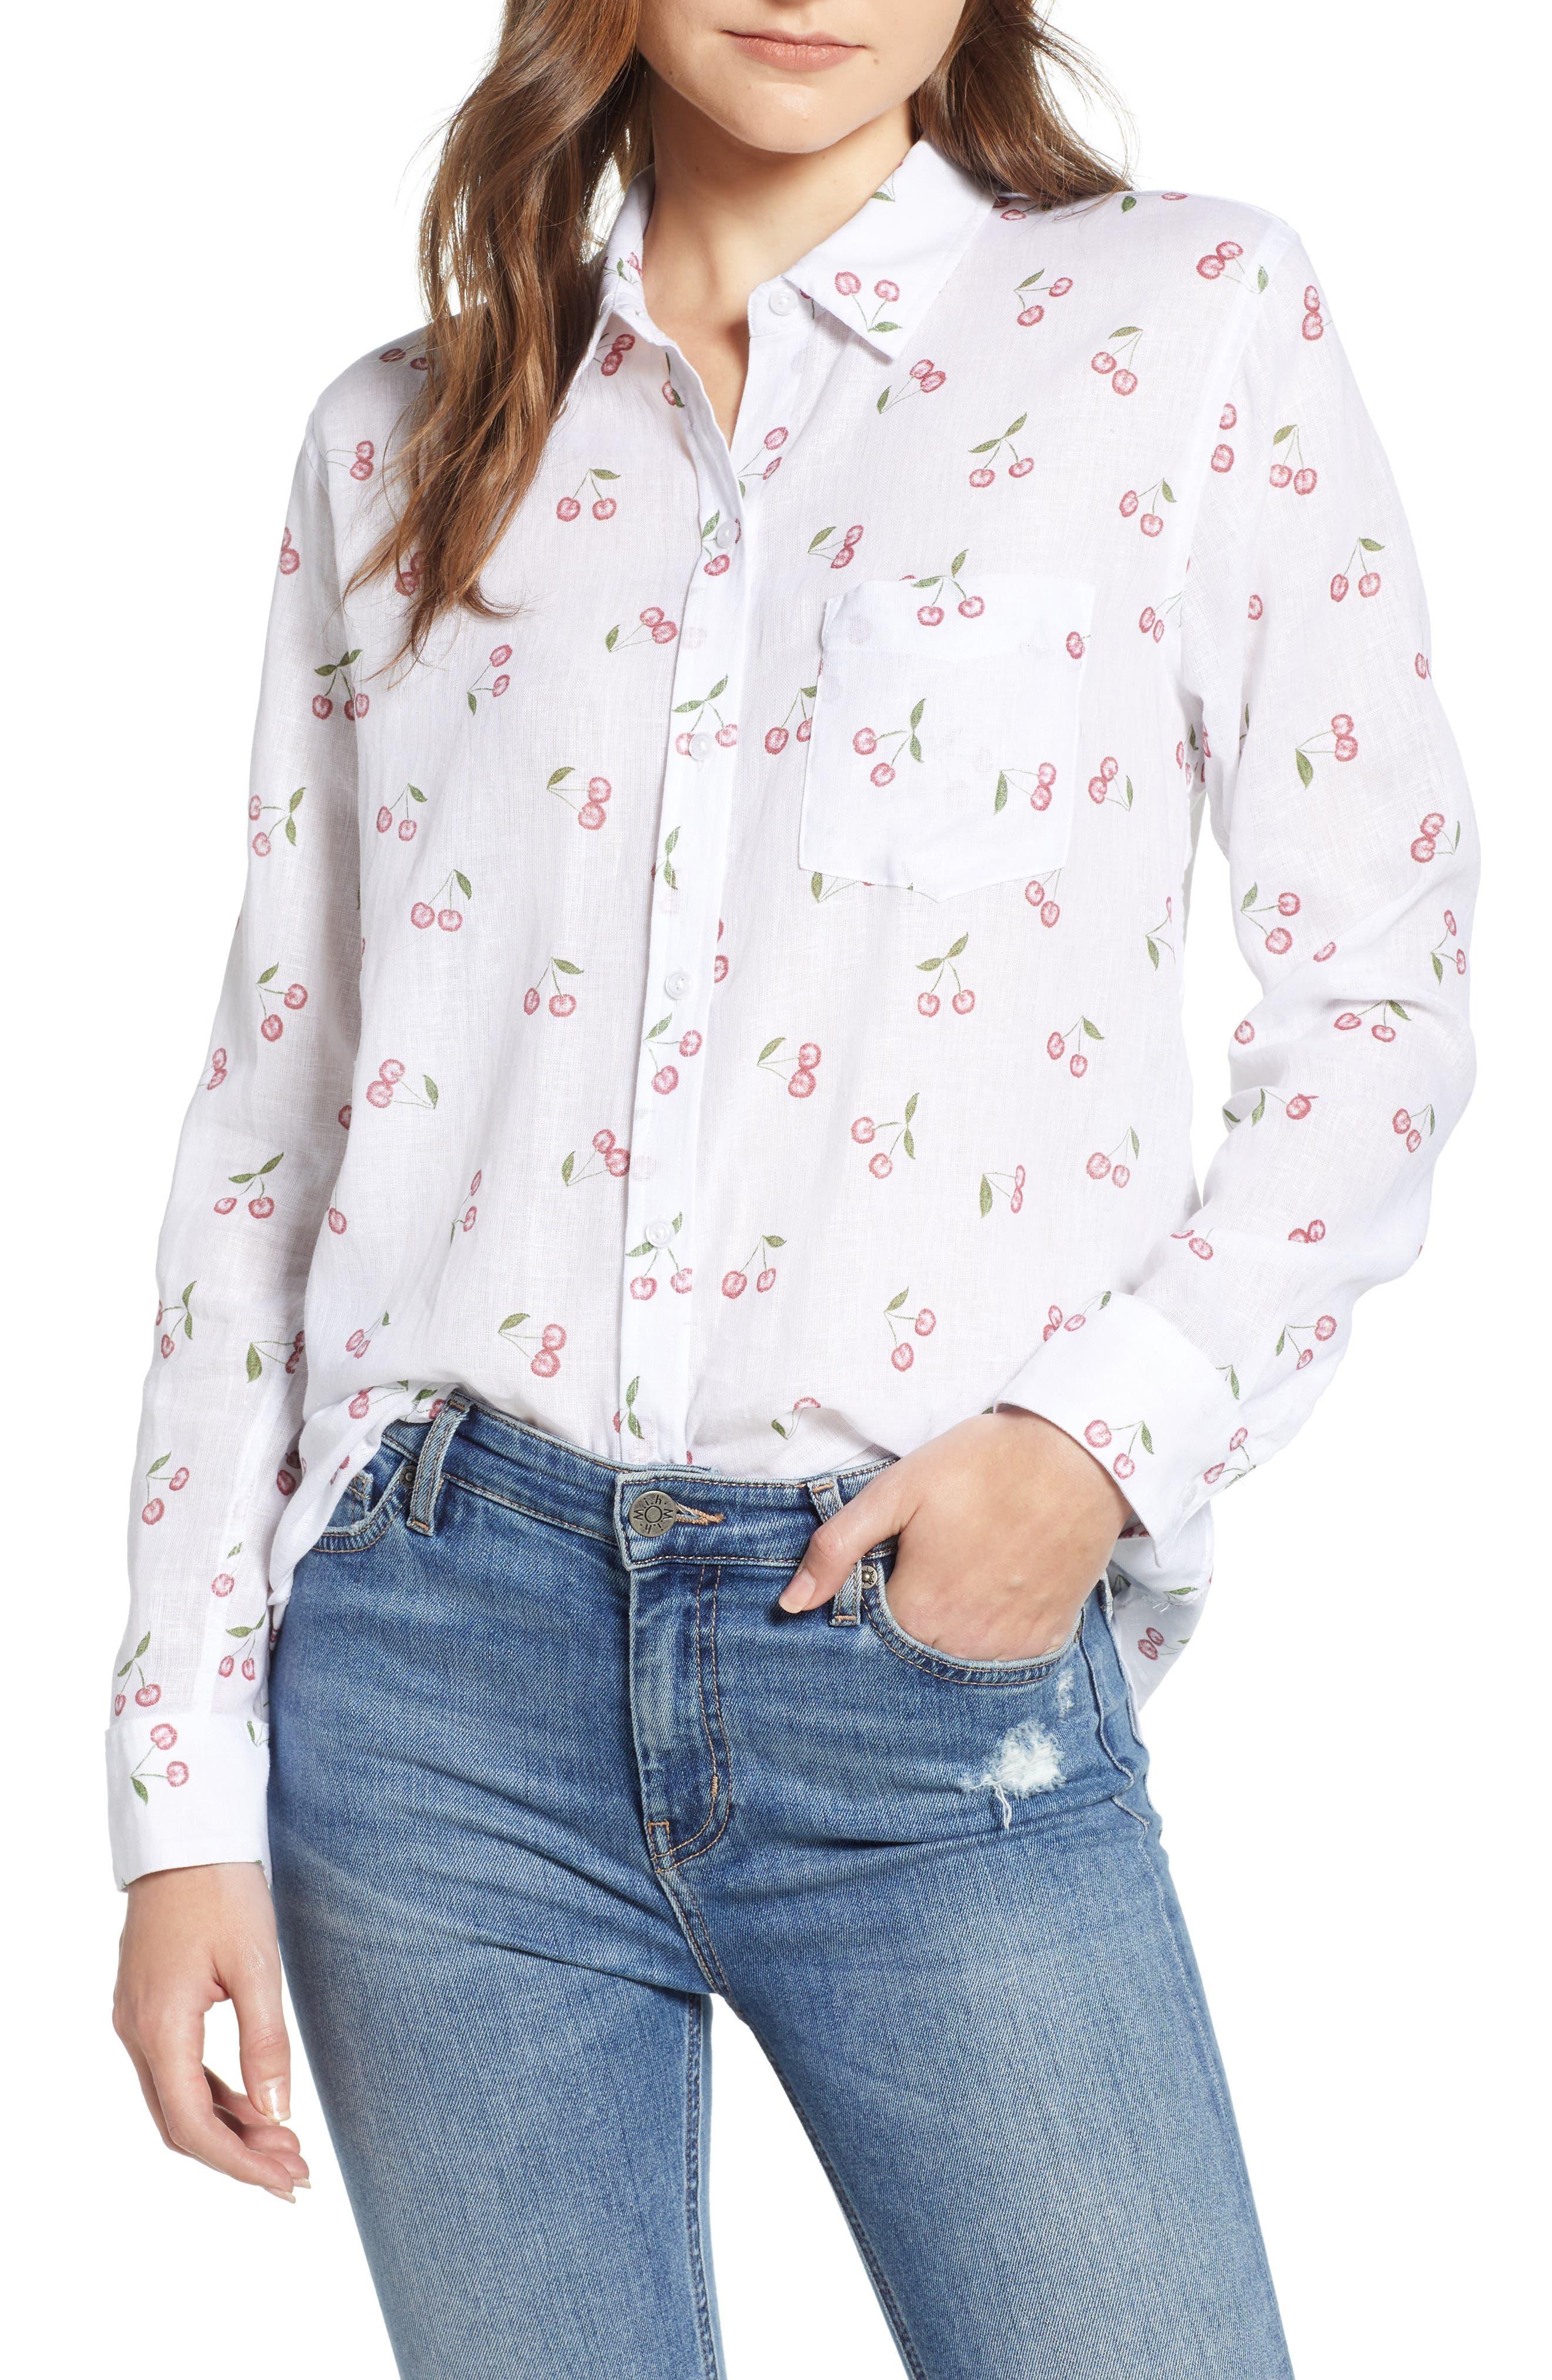 Charli Shirt,                             Main thumbnail 1, color,                             White Cherries